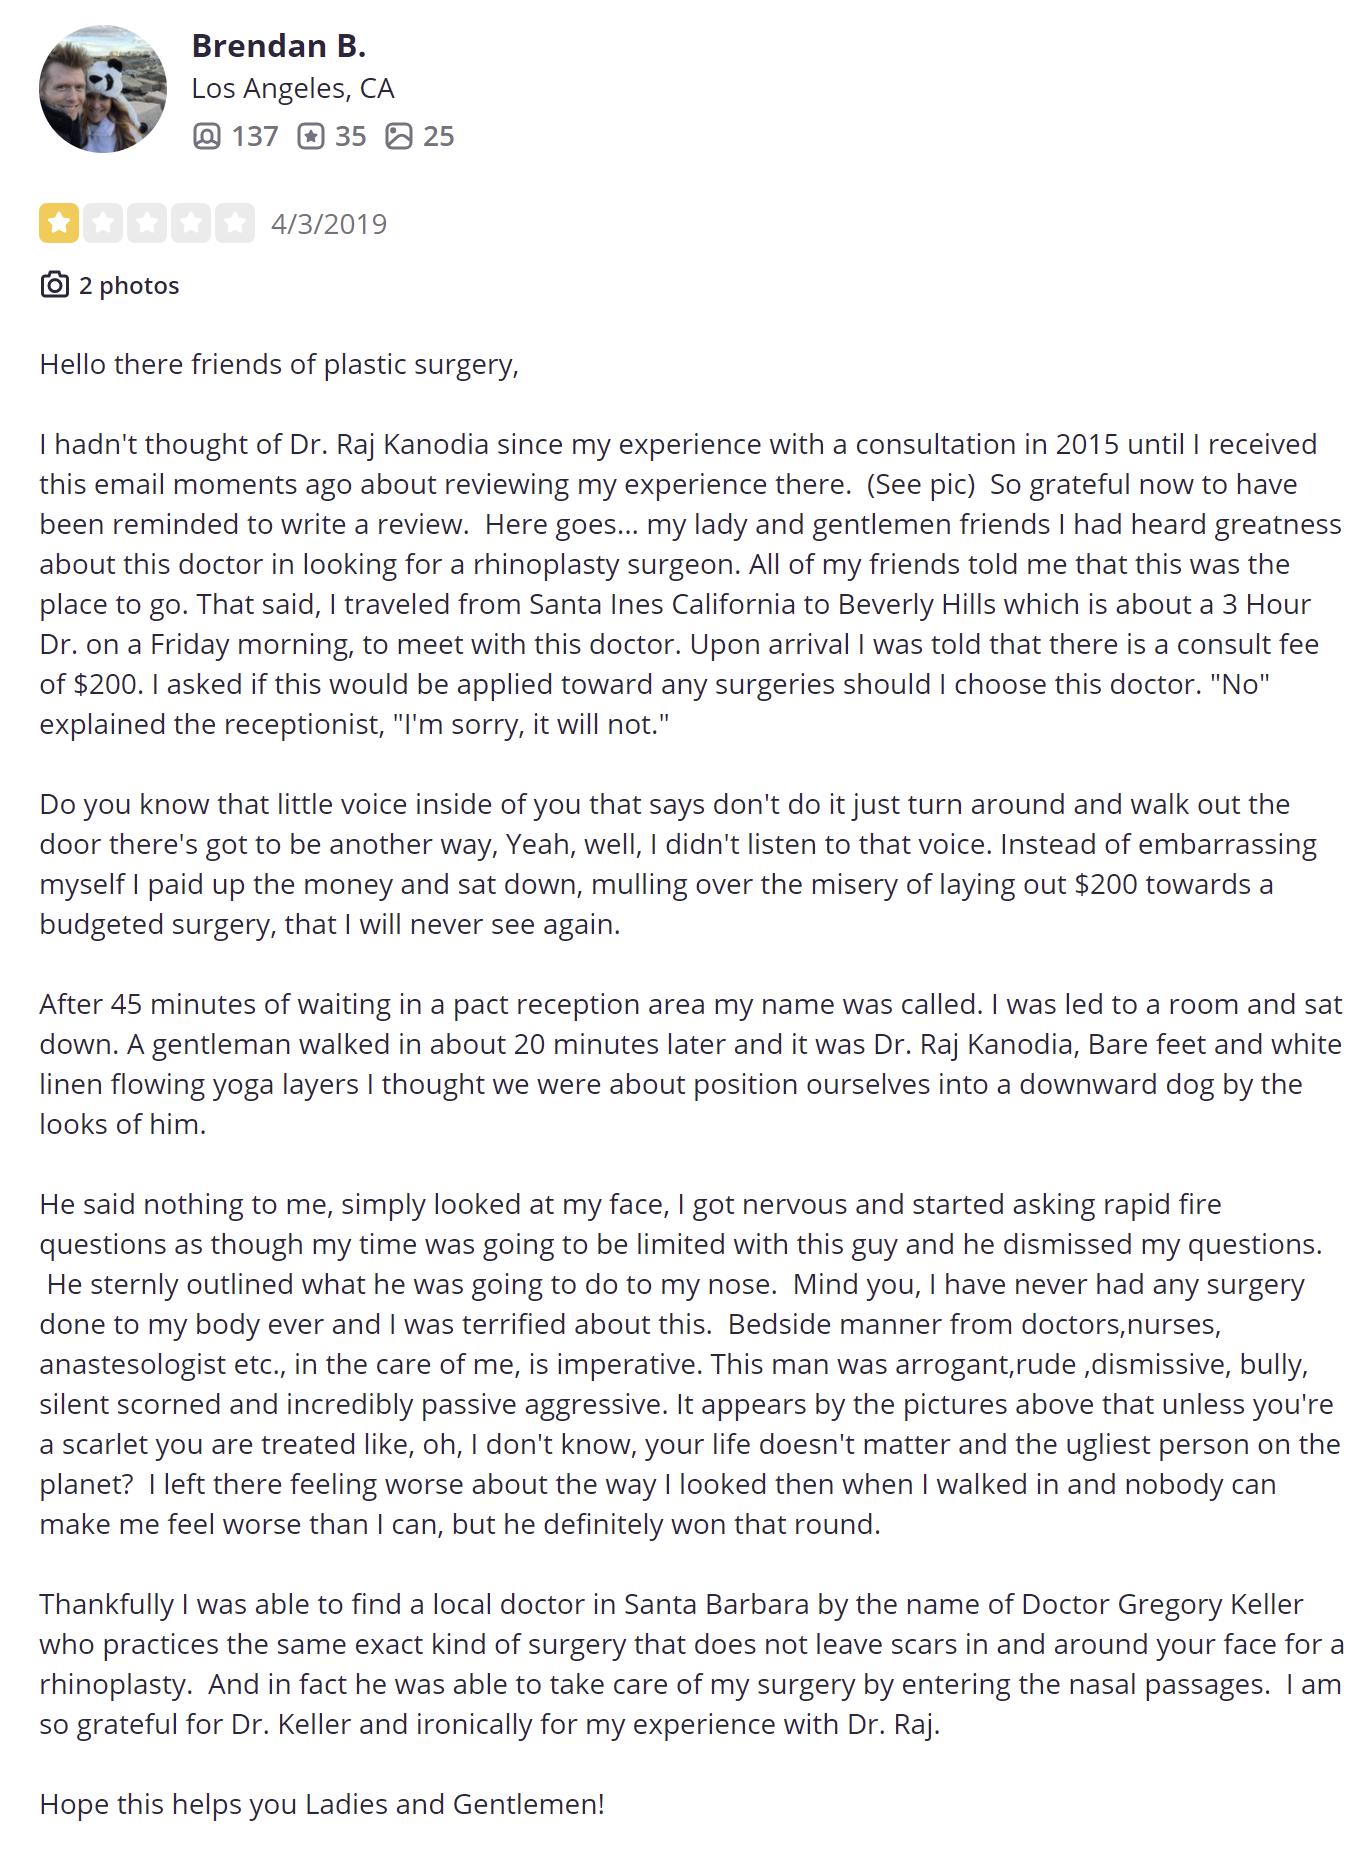 Dr. Raj Kanodia Rhinoplasty & Medspa review